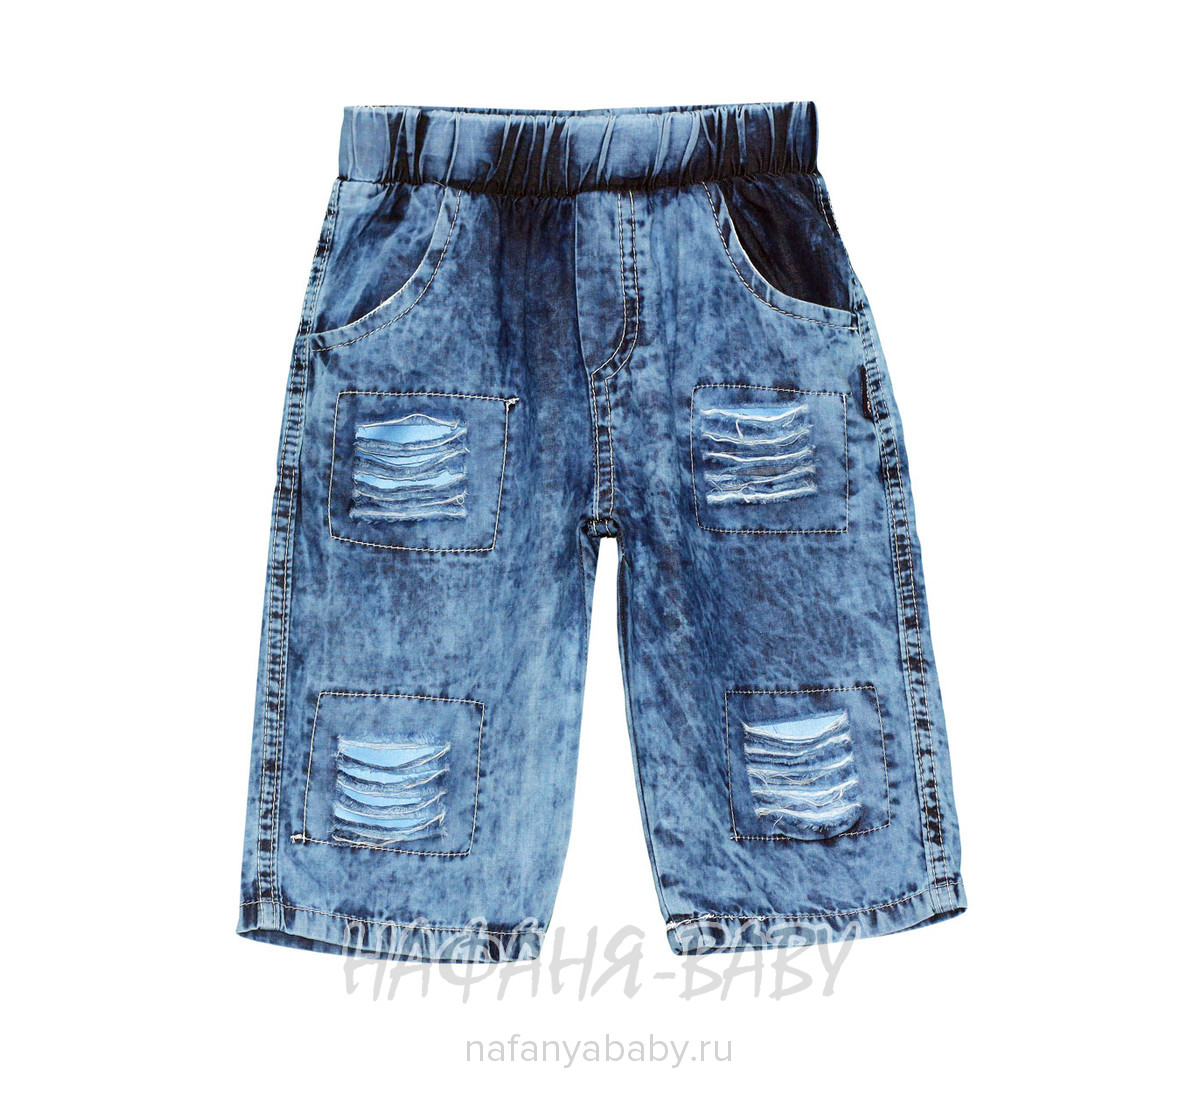 Детские шорты AKIRA арт: 2107, цвет синий, оптом Турция